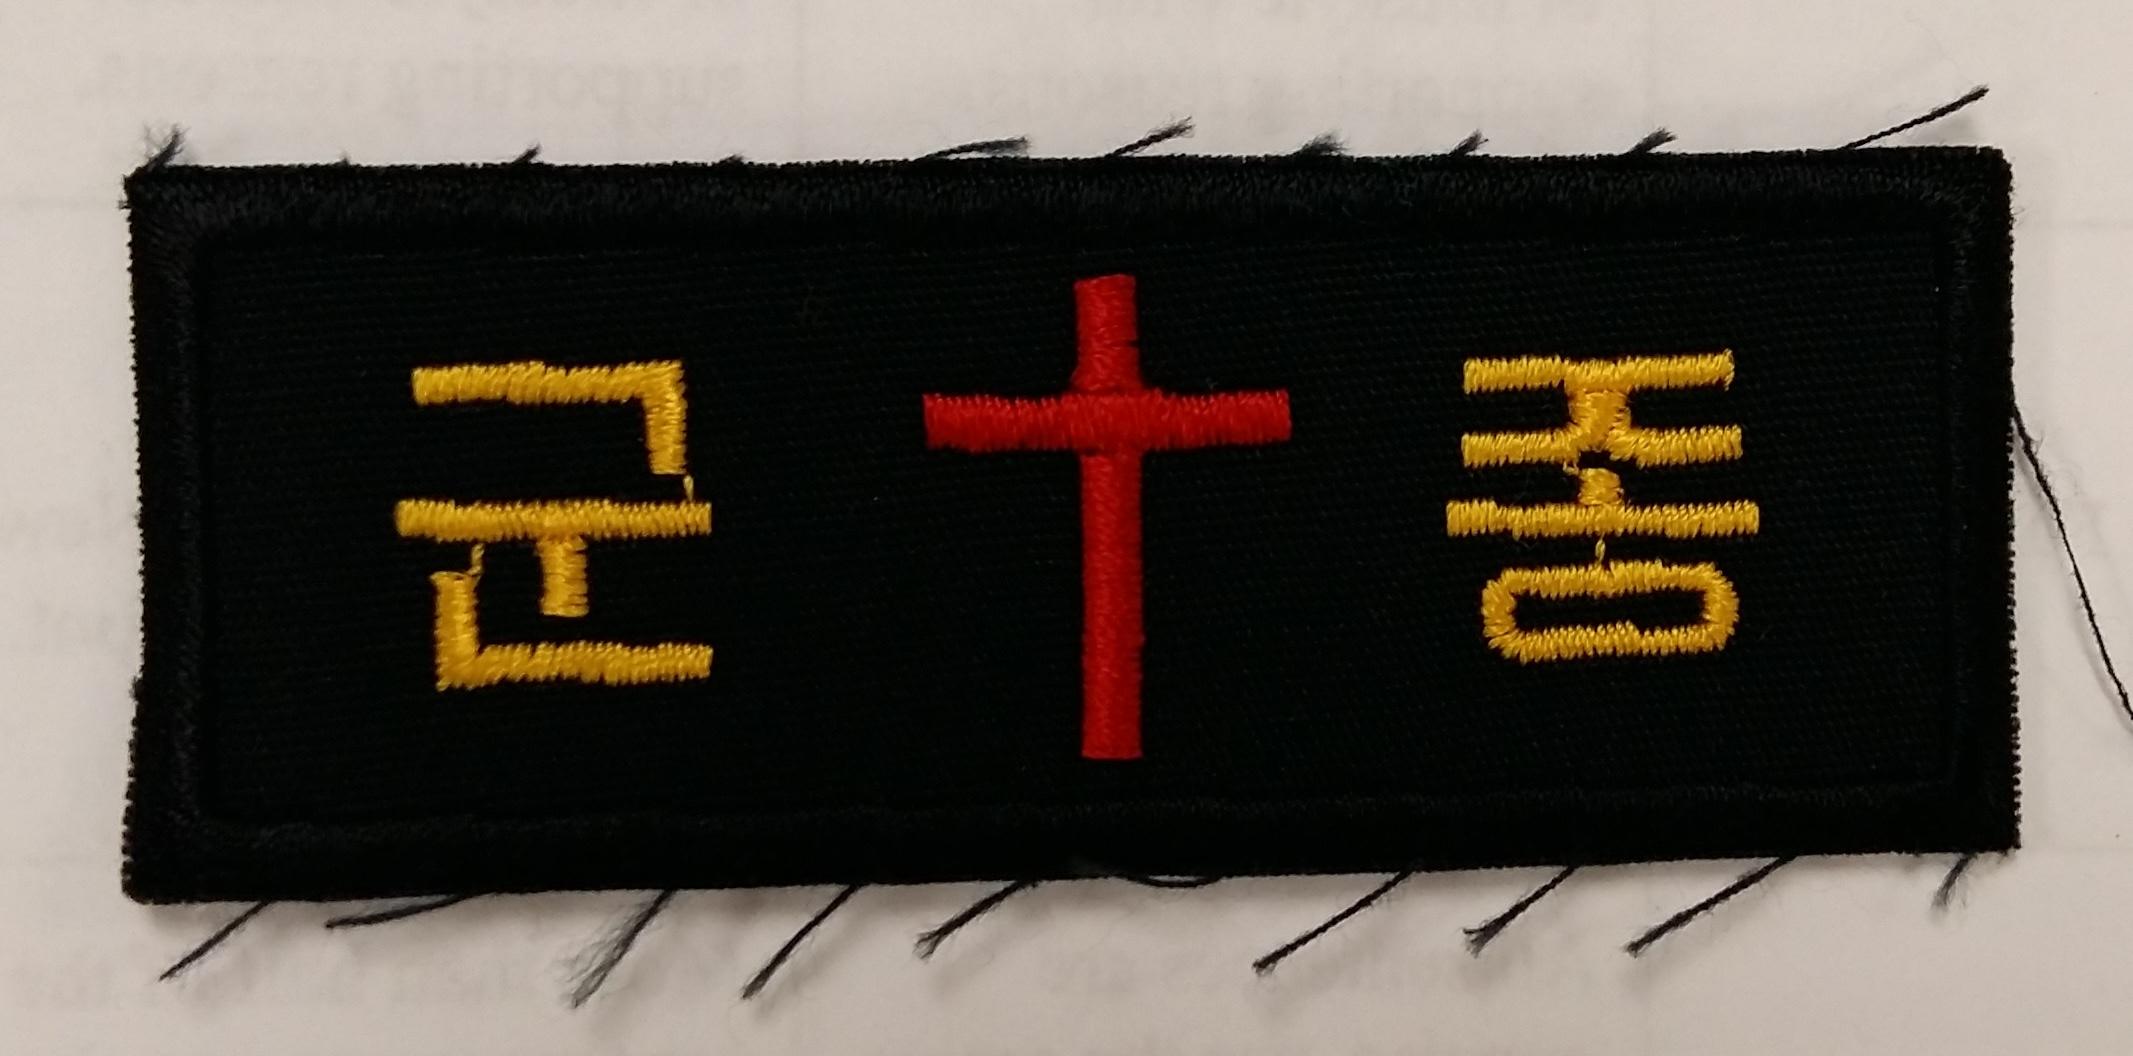 Delightful ROK Chaplain Assistant Insignia